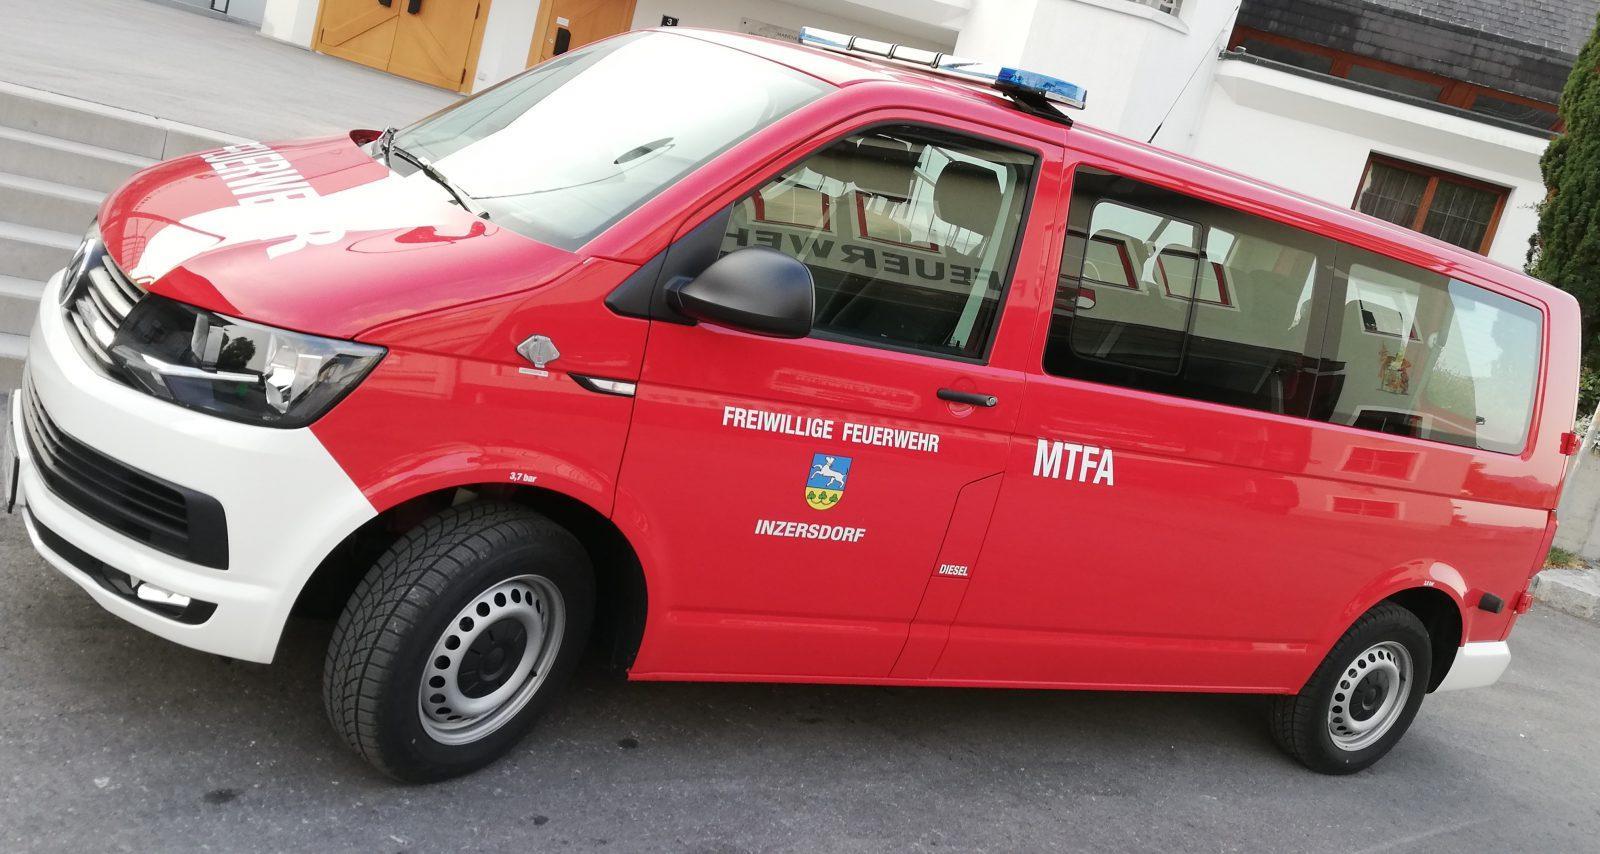 MTFA neu